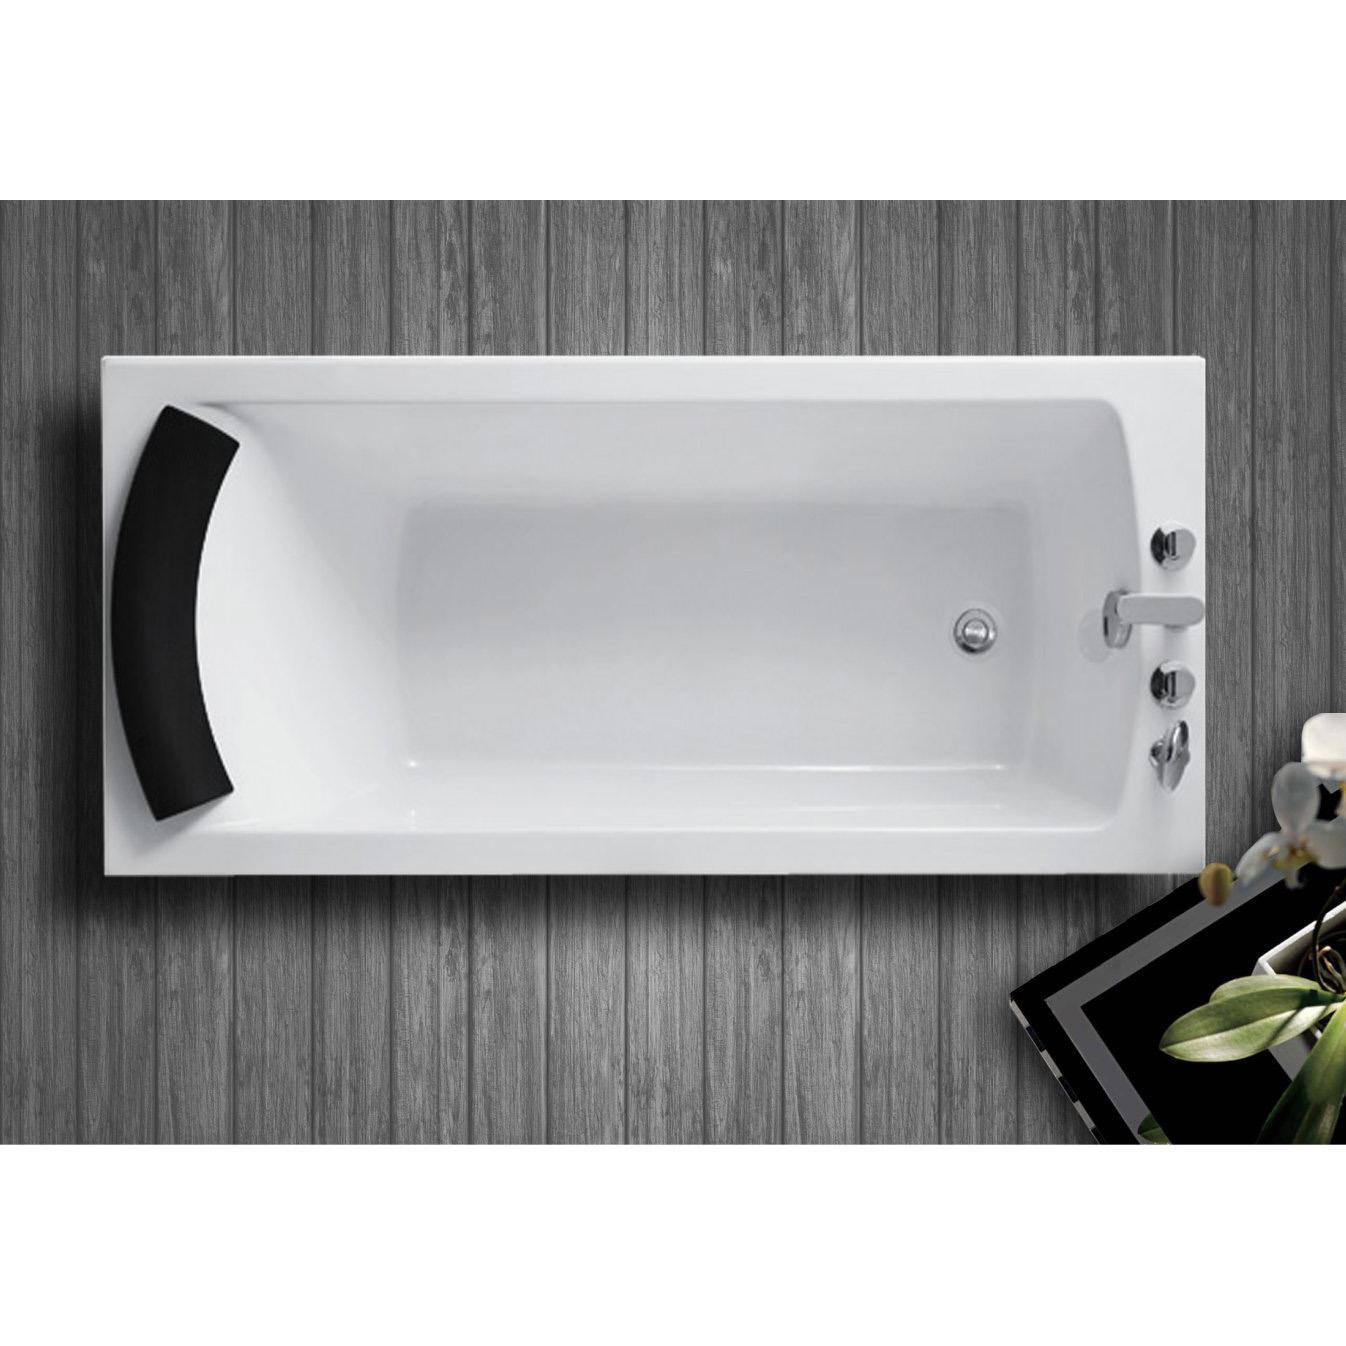 Акриловая ванна Royal bath Vienna RB953203 170х70 vienna 1 15 000